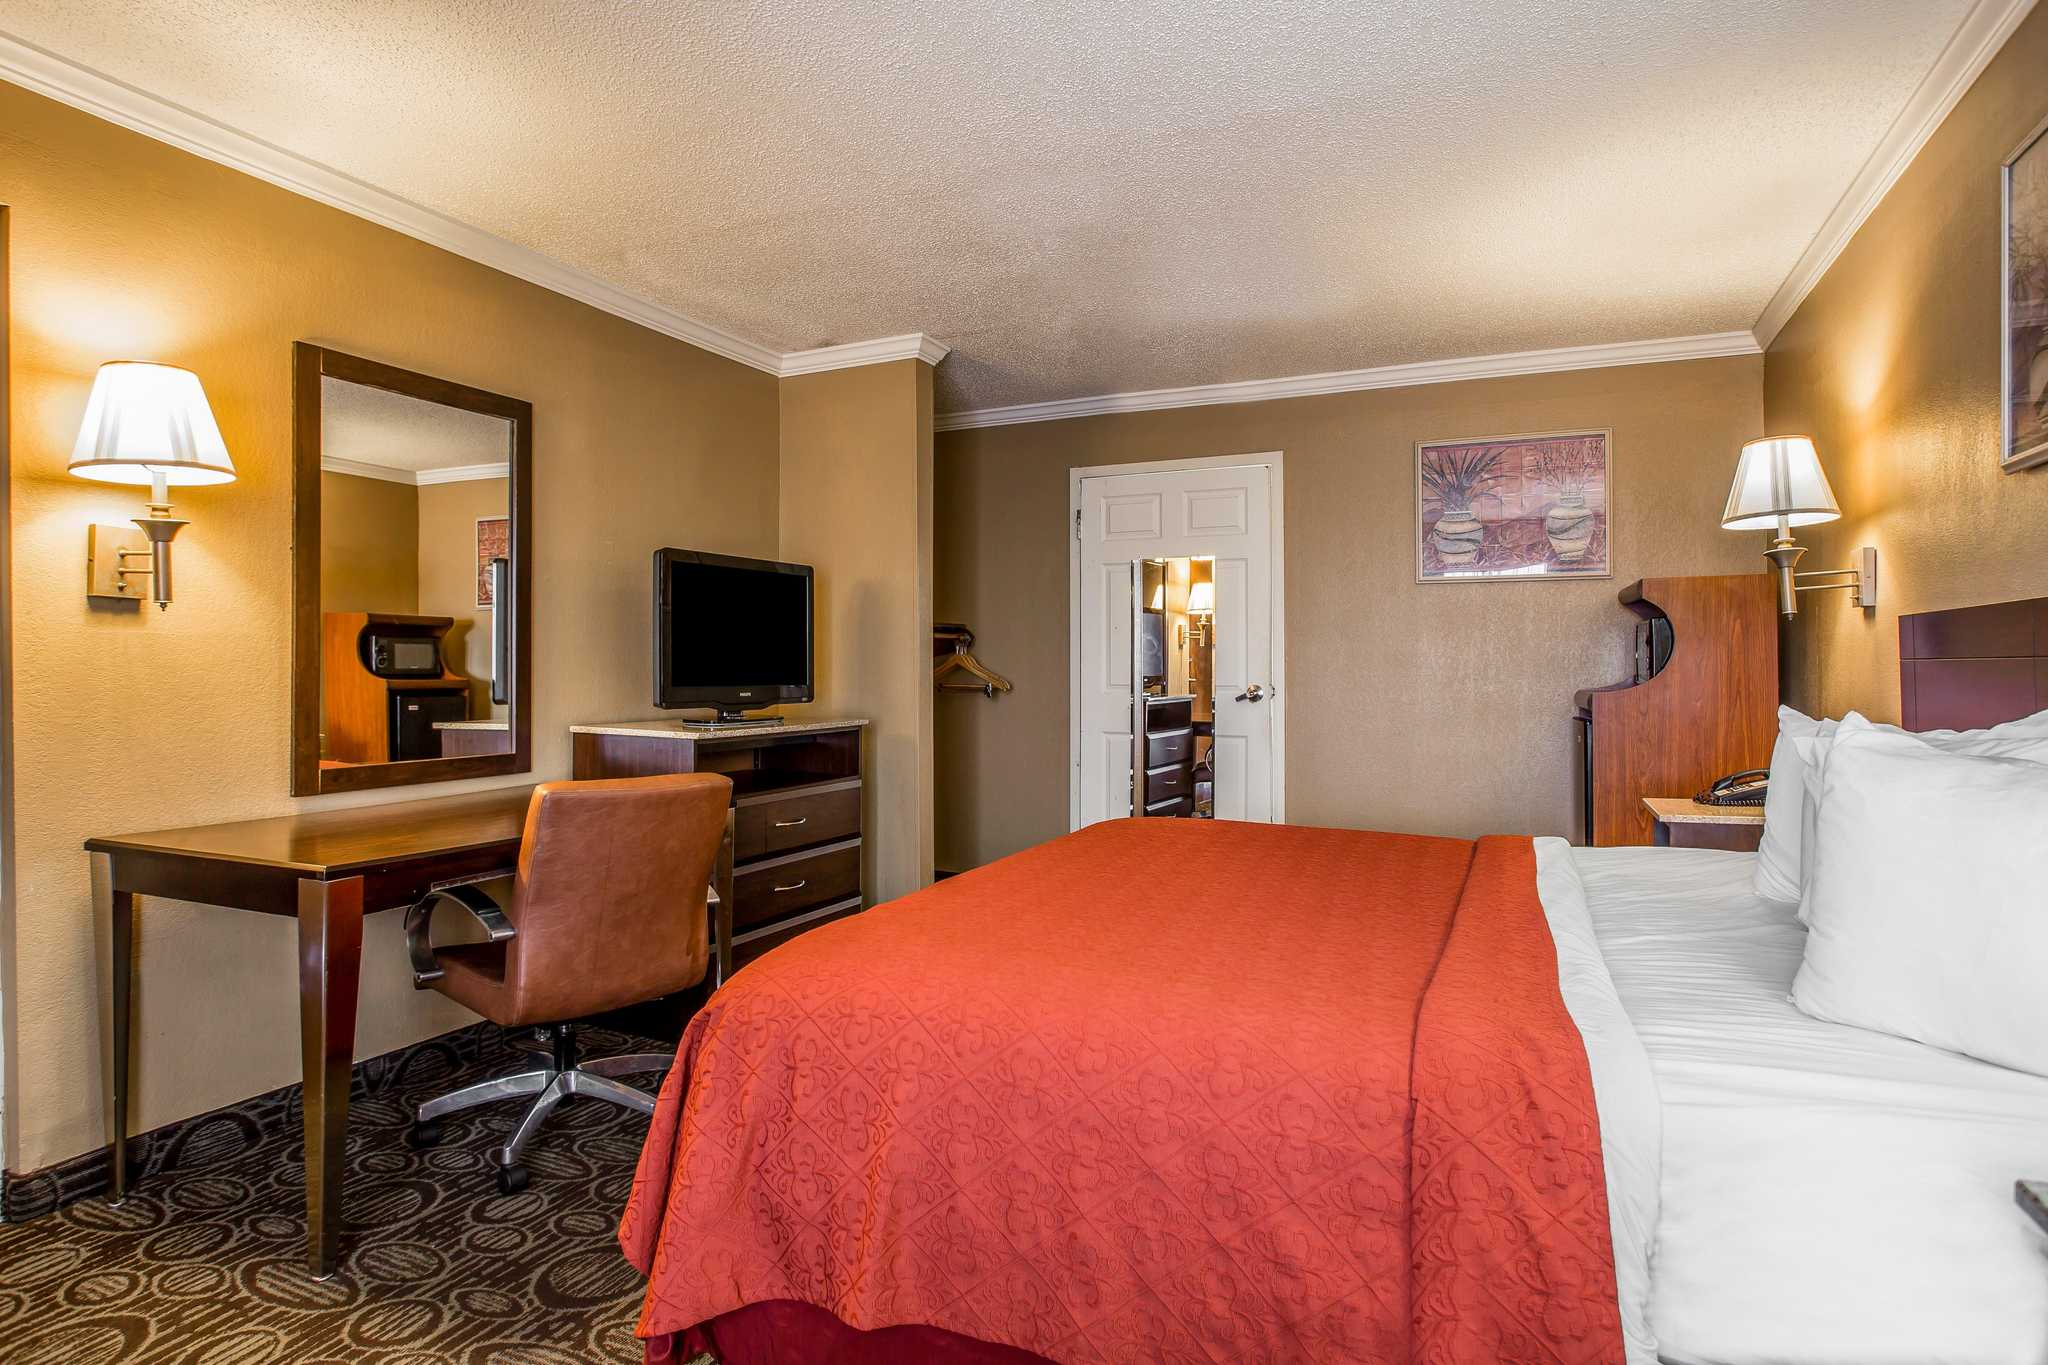 Quality Inn & Suites Ft. Jackson Maingate image 18